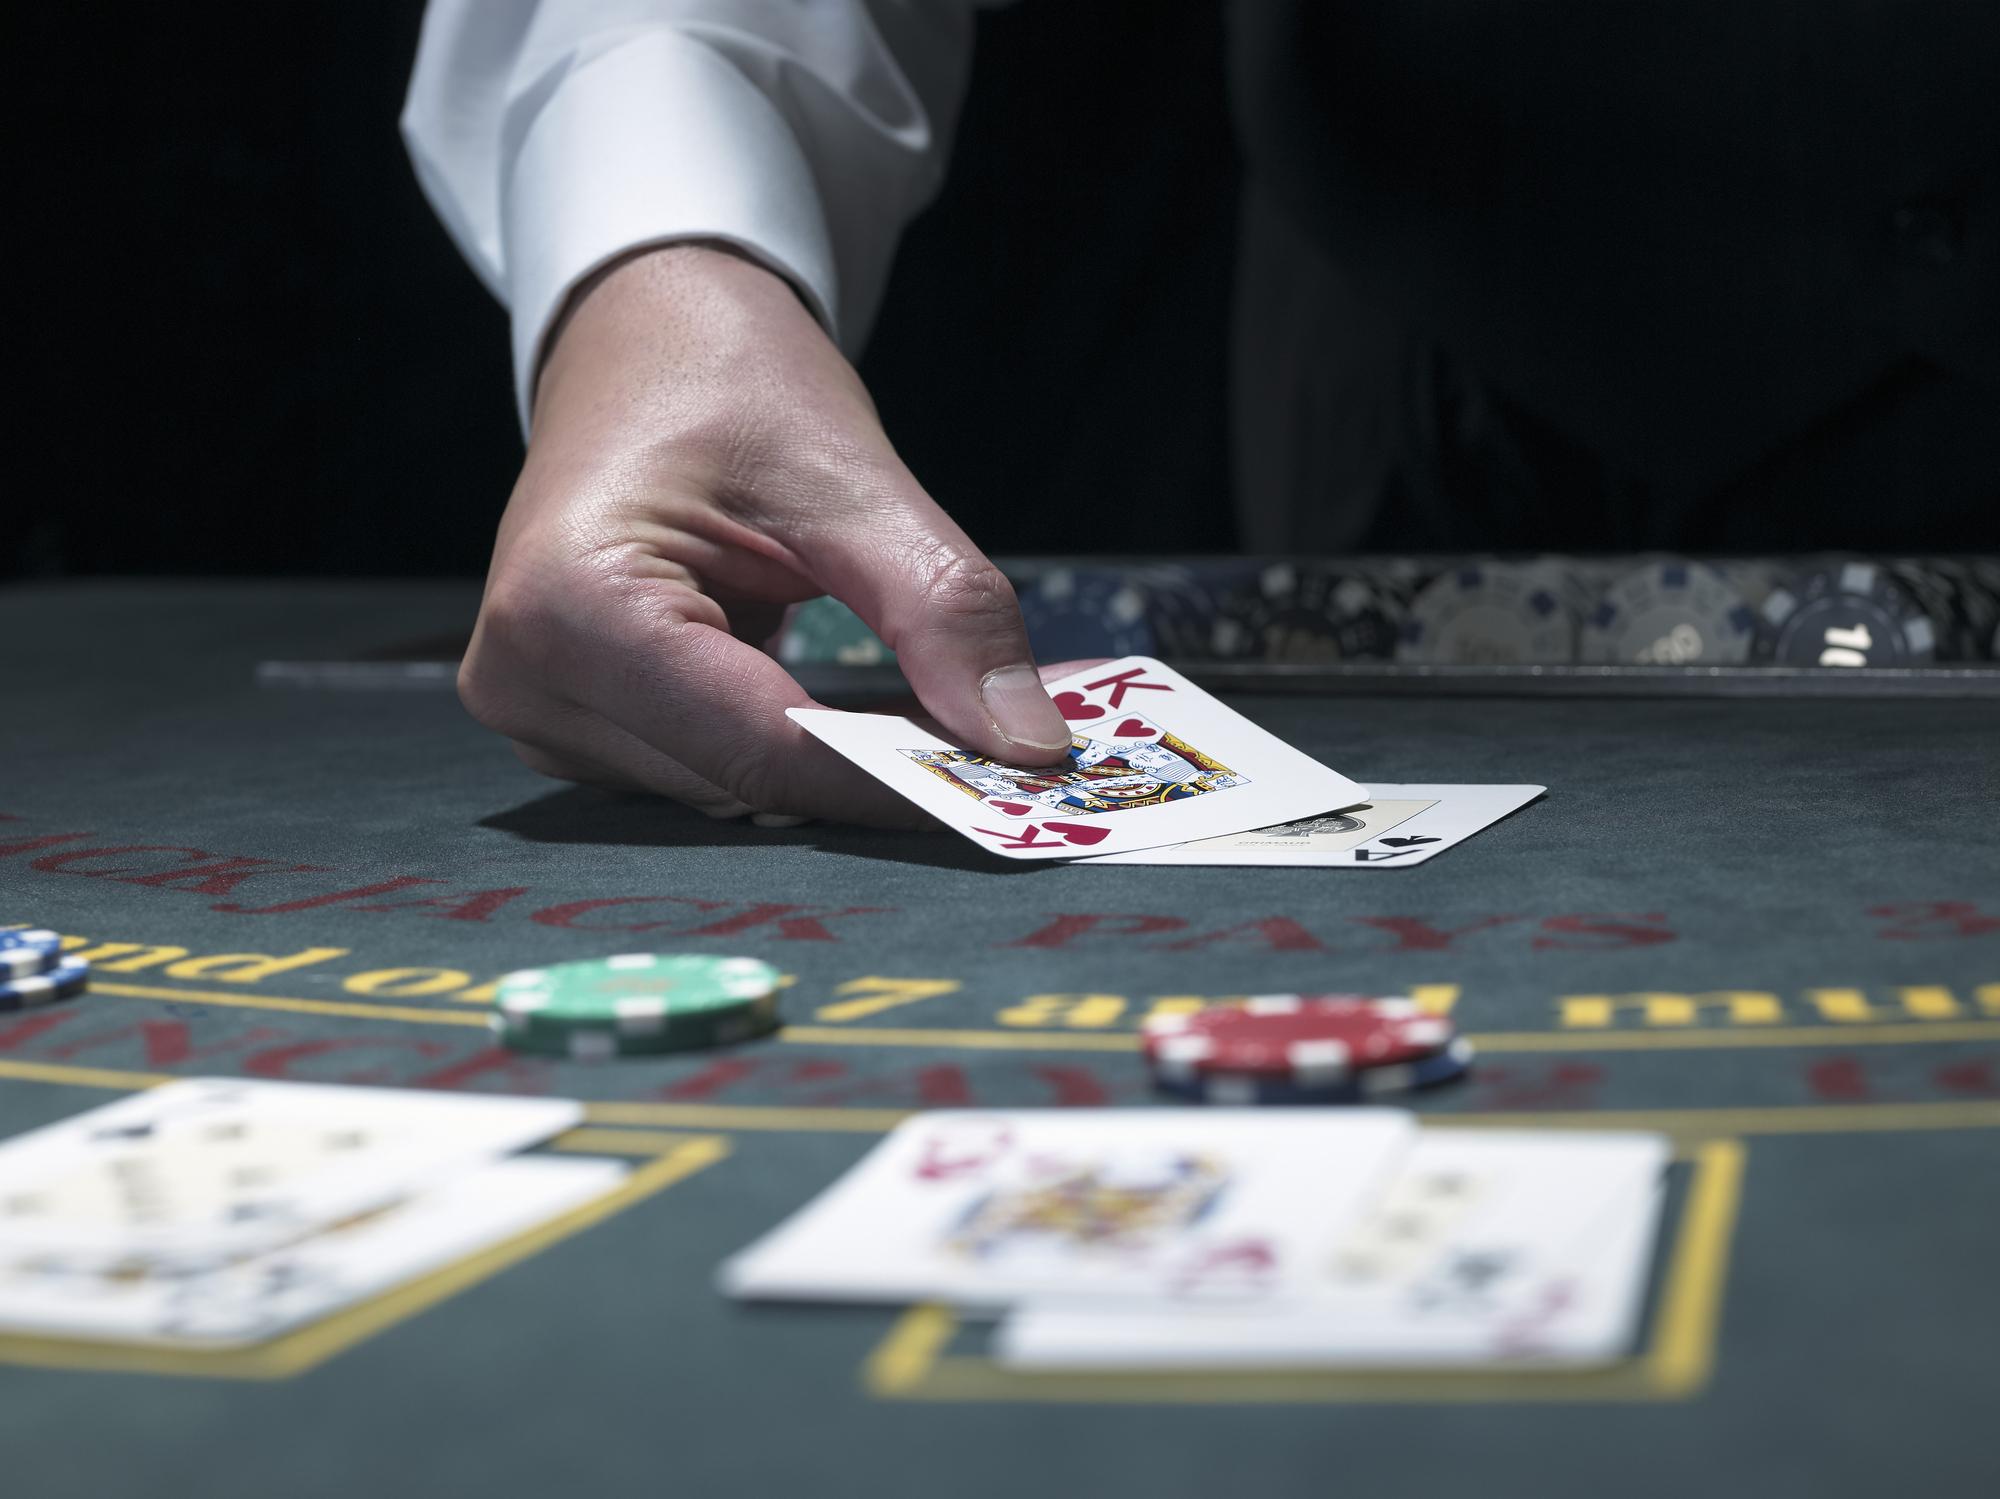 A blackjack dealer puts cards on the table.